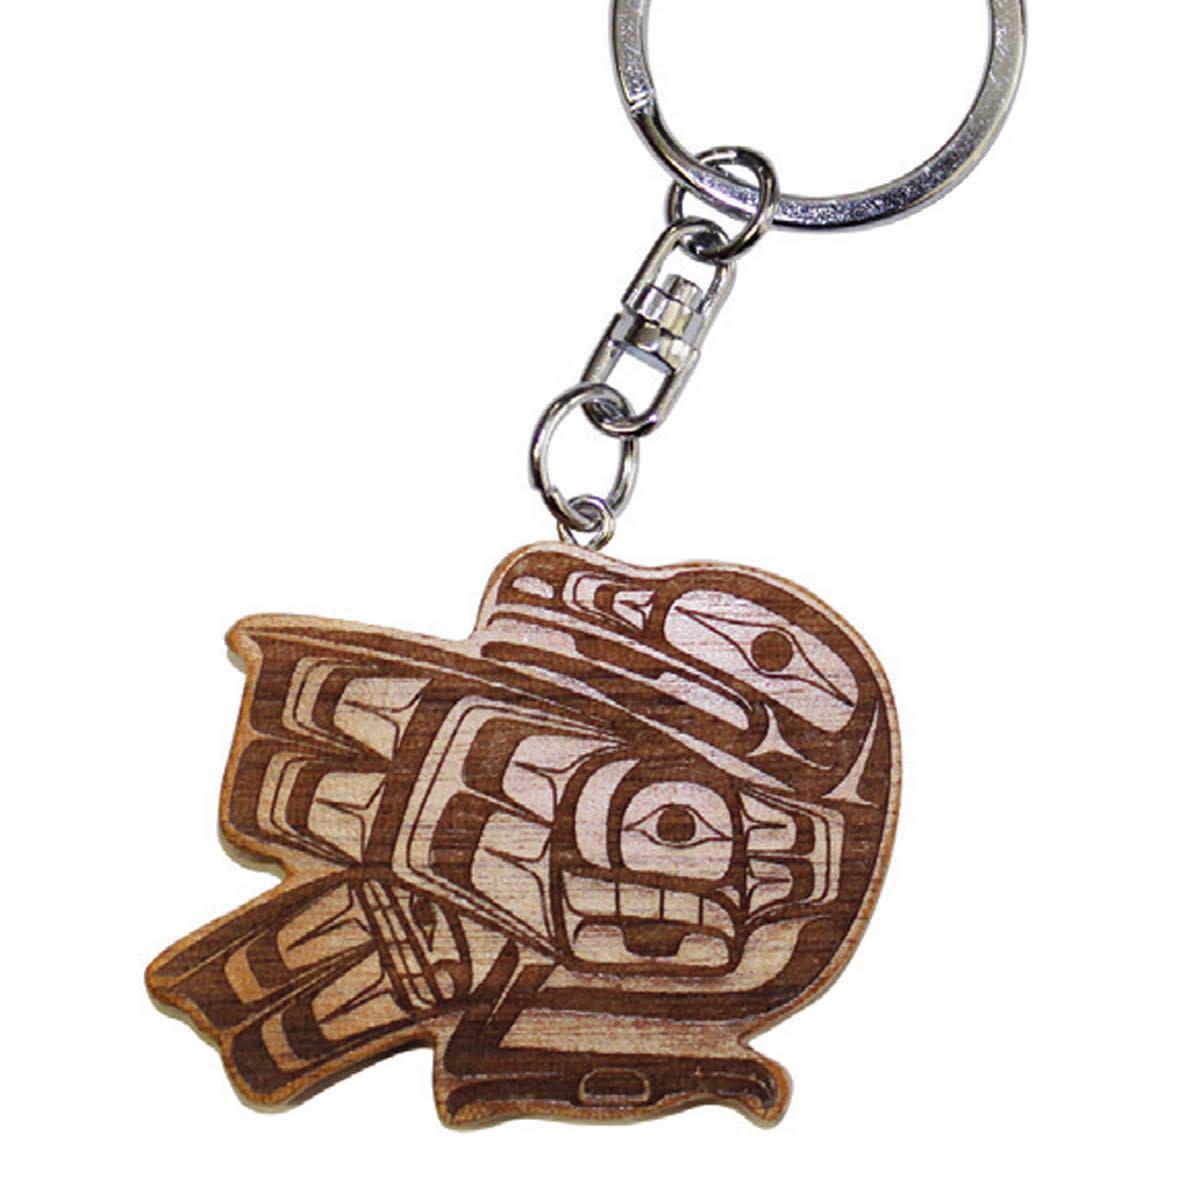 Wooden Key Chain-5